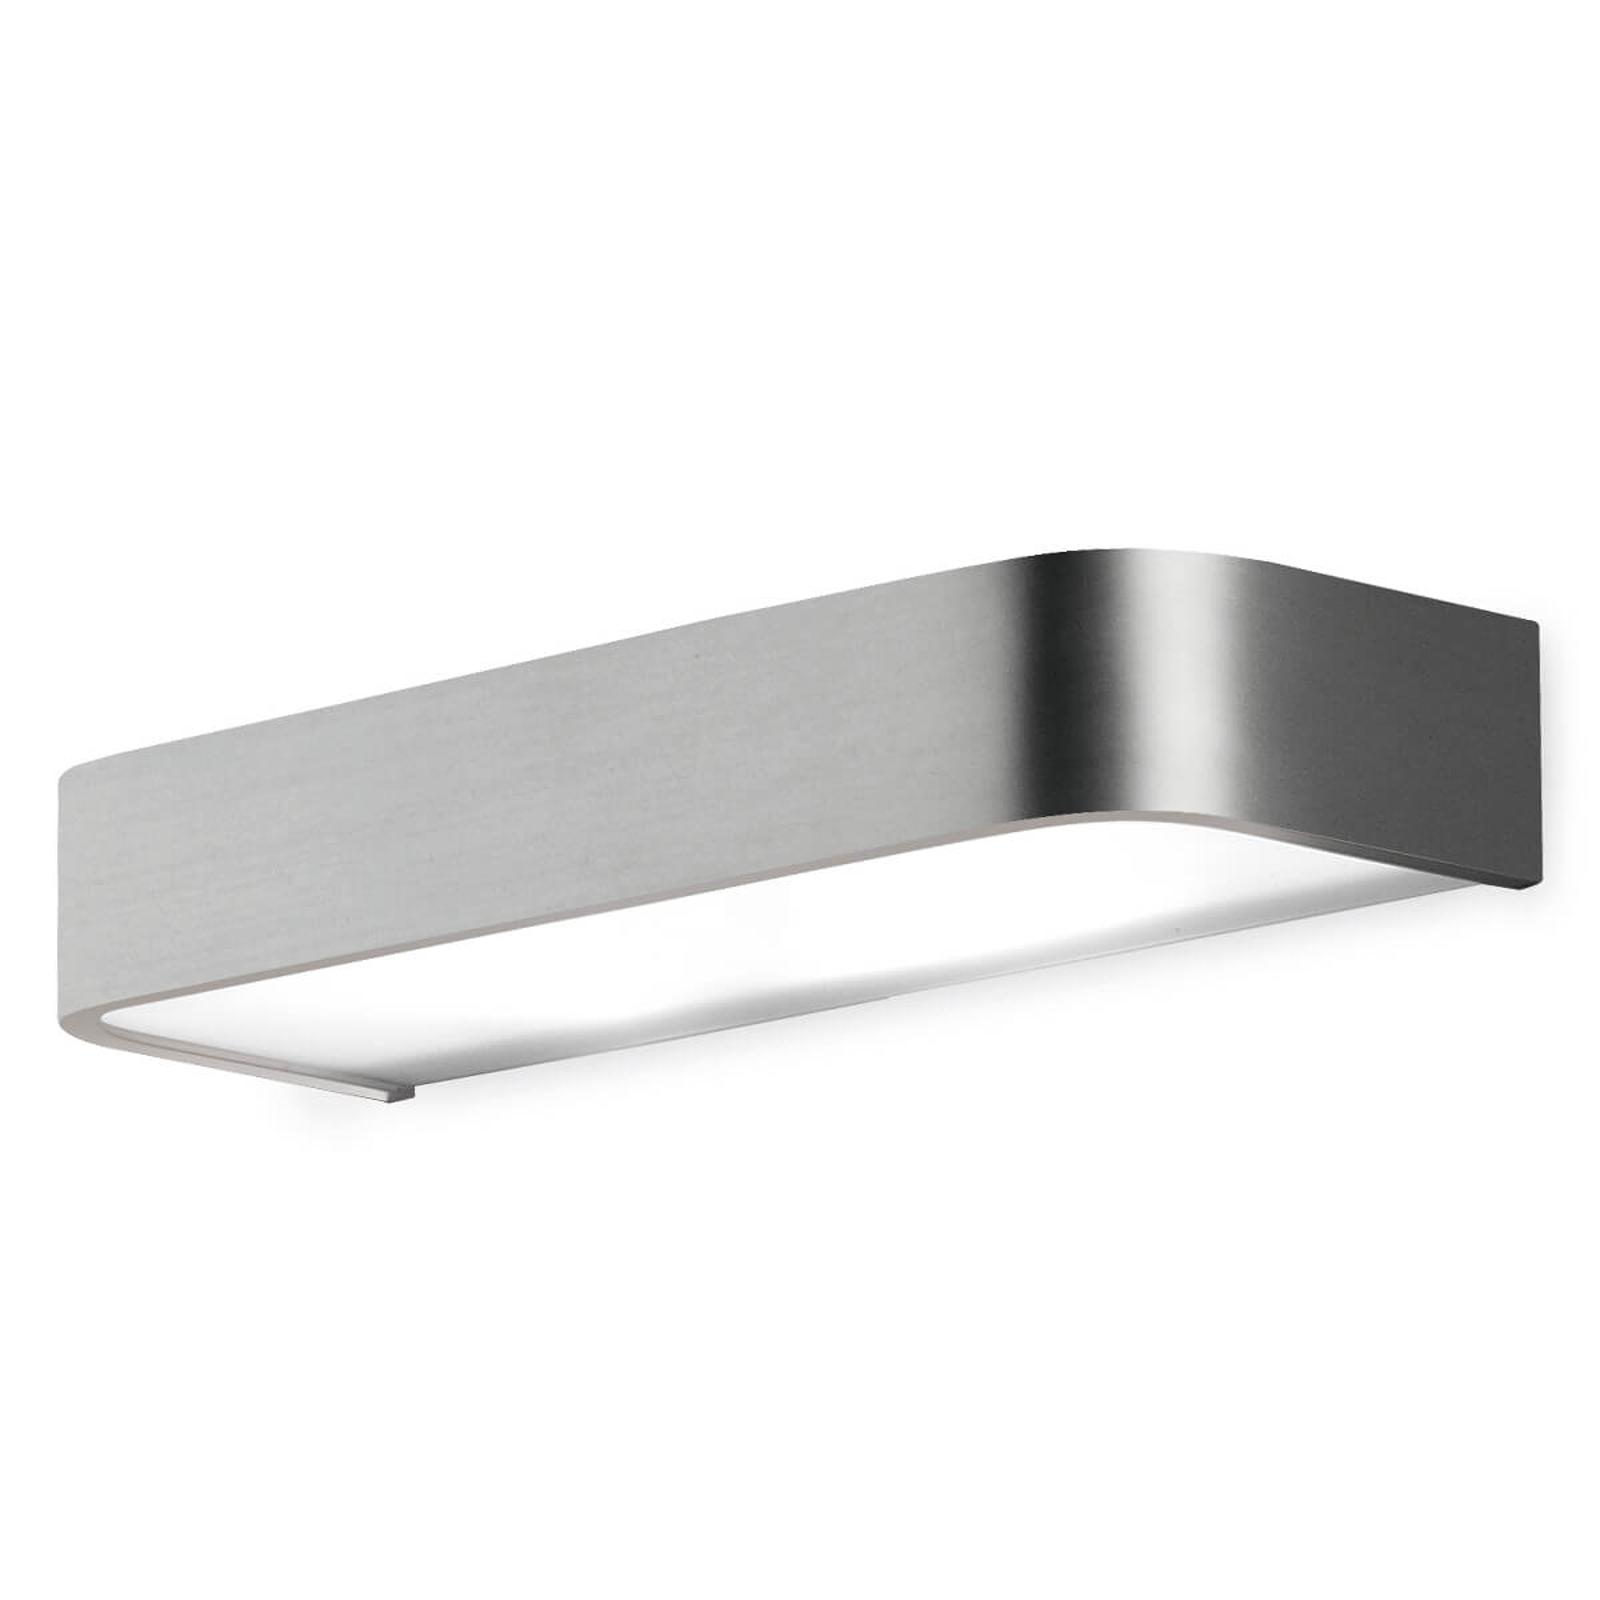 Applique de salle de bain Arcos LED, 30cm nickel